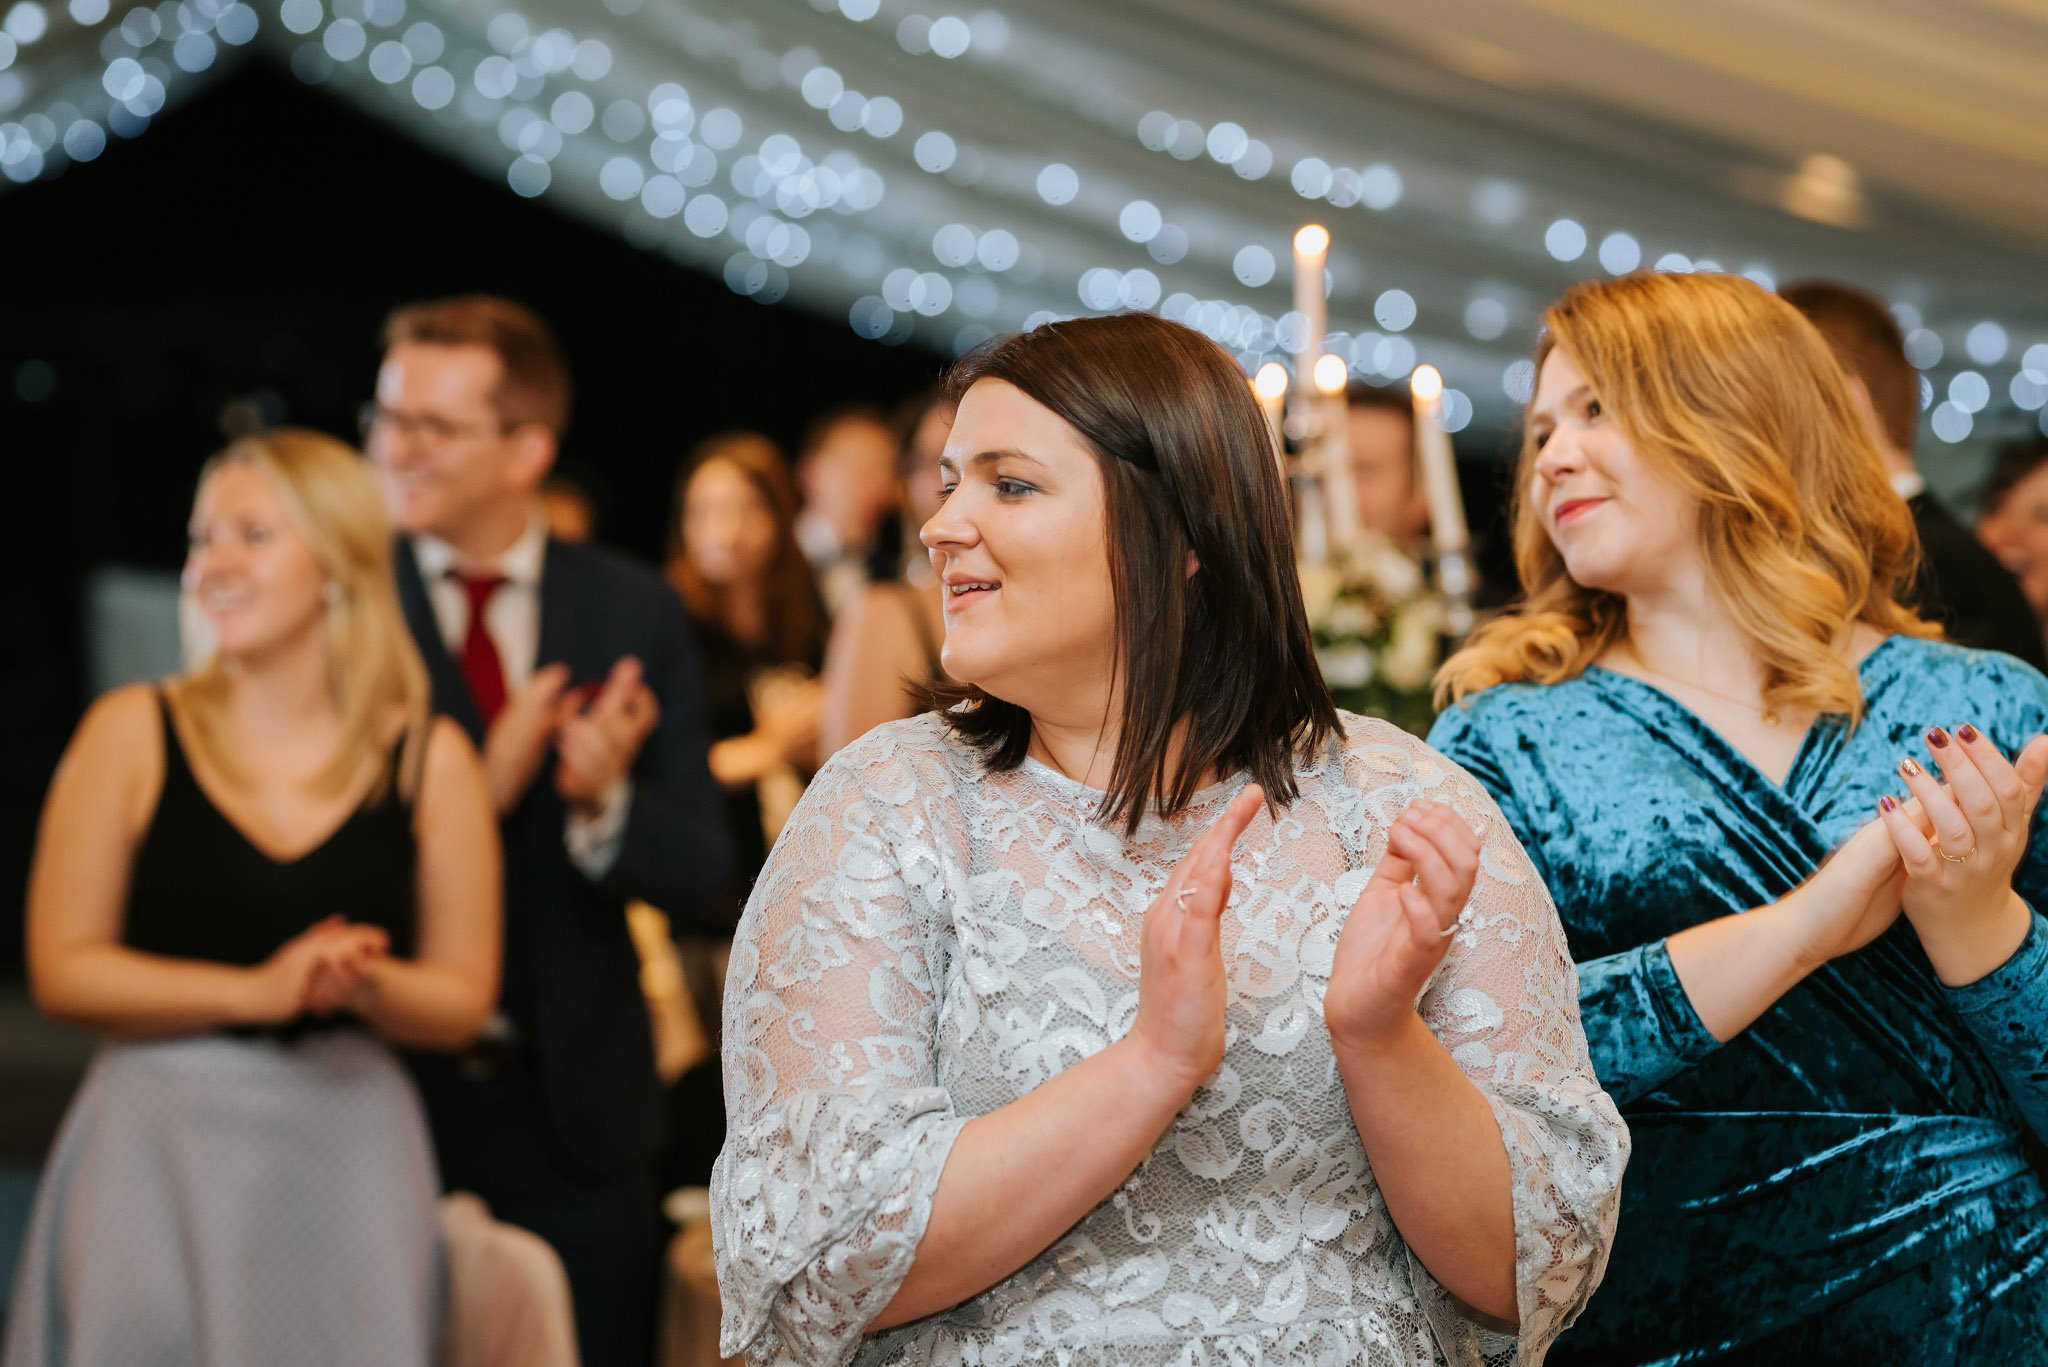 Coombe Abbey wedding in Coventry, Warwickshire - Sam + Matt 58